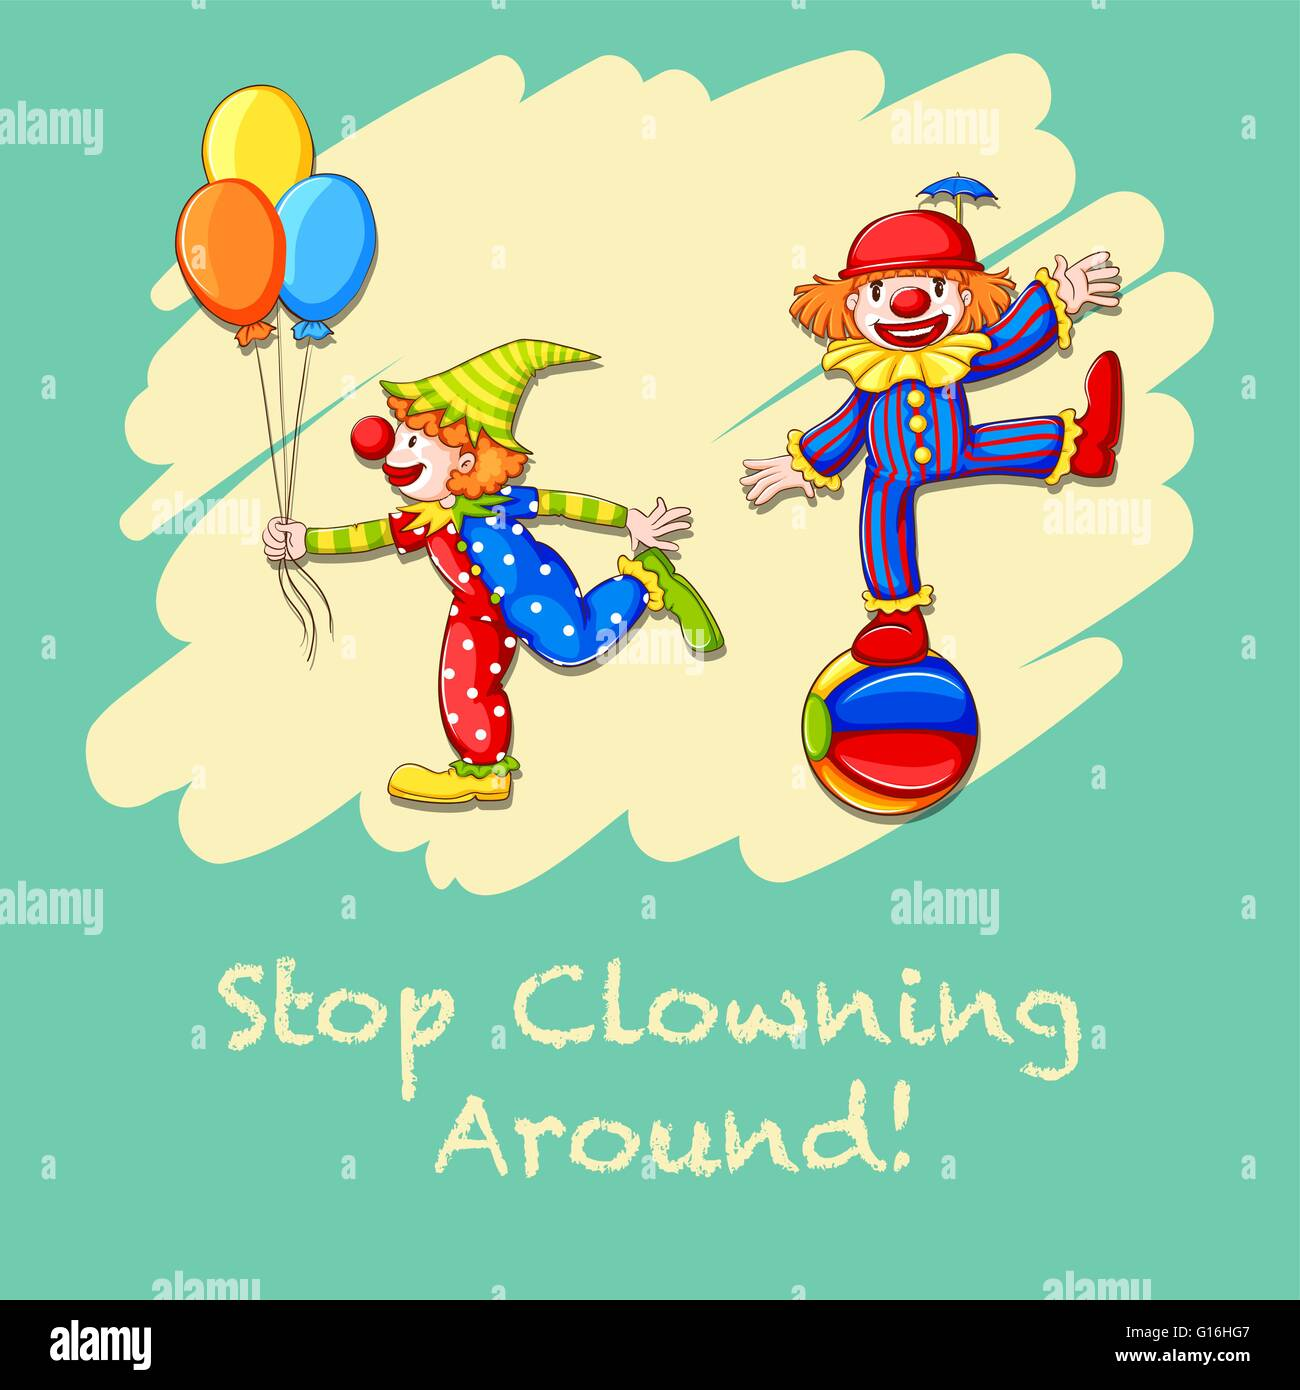 Idiom saying stop clowning around - Stock Vector